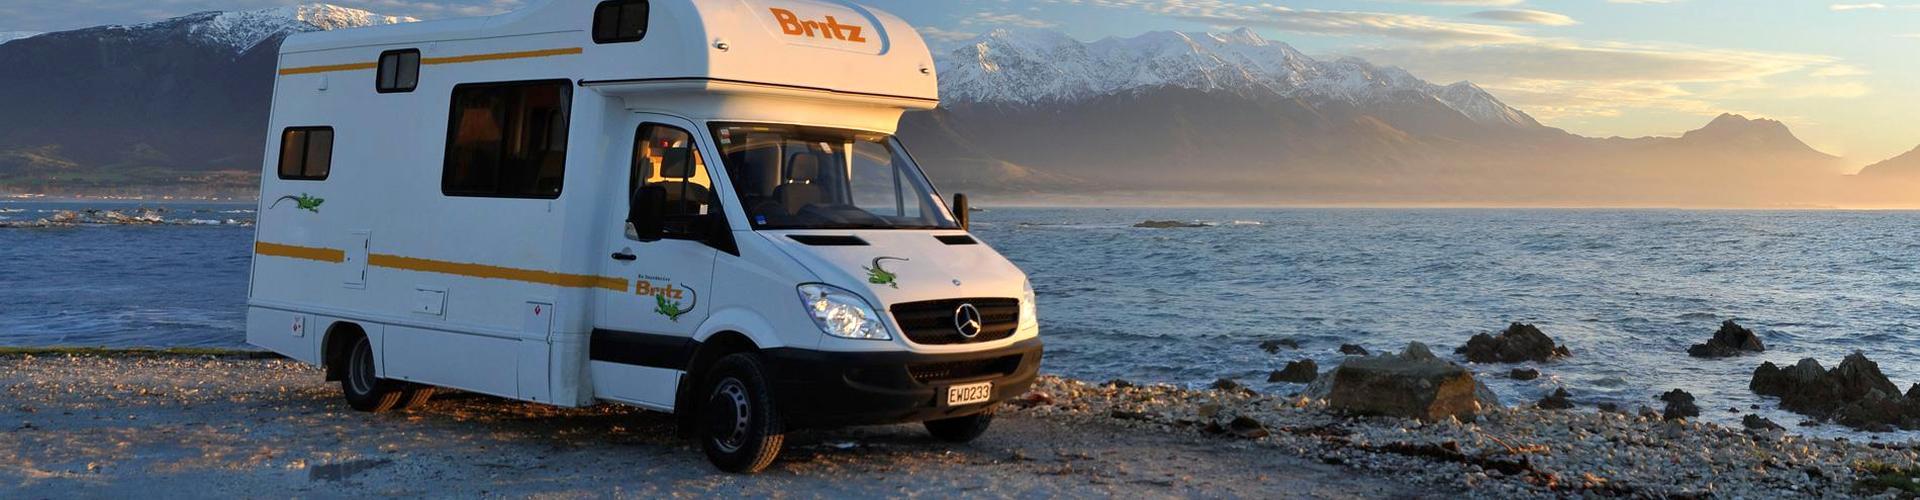 Camper Neuseeland mieten